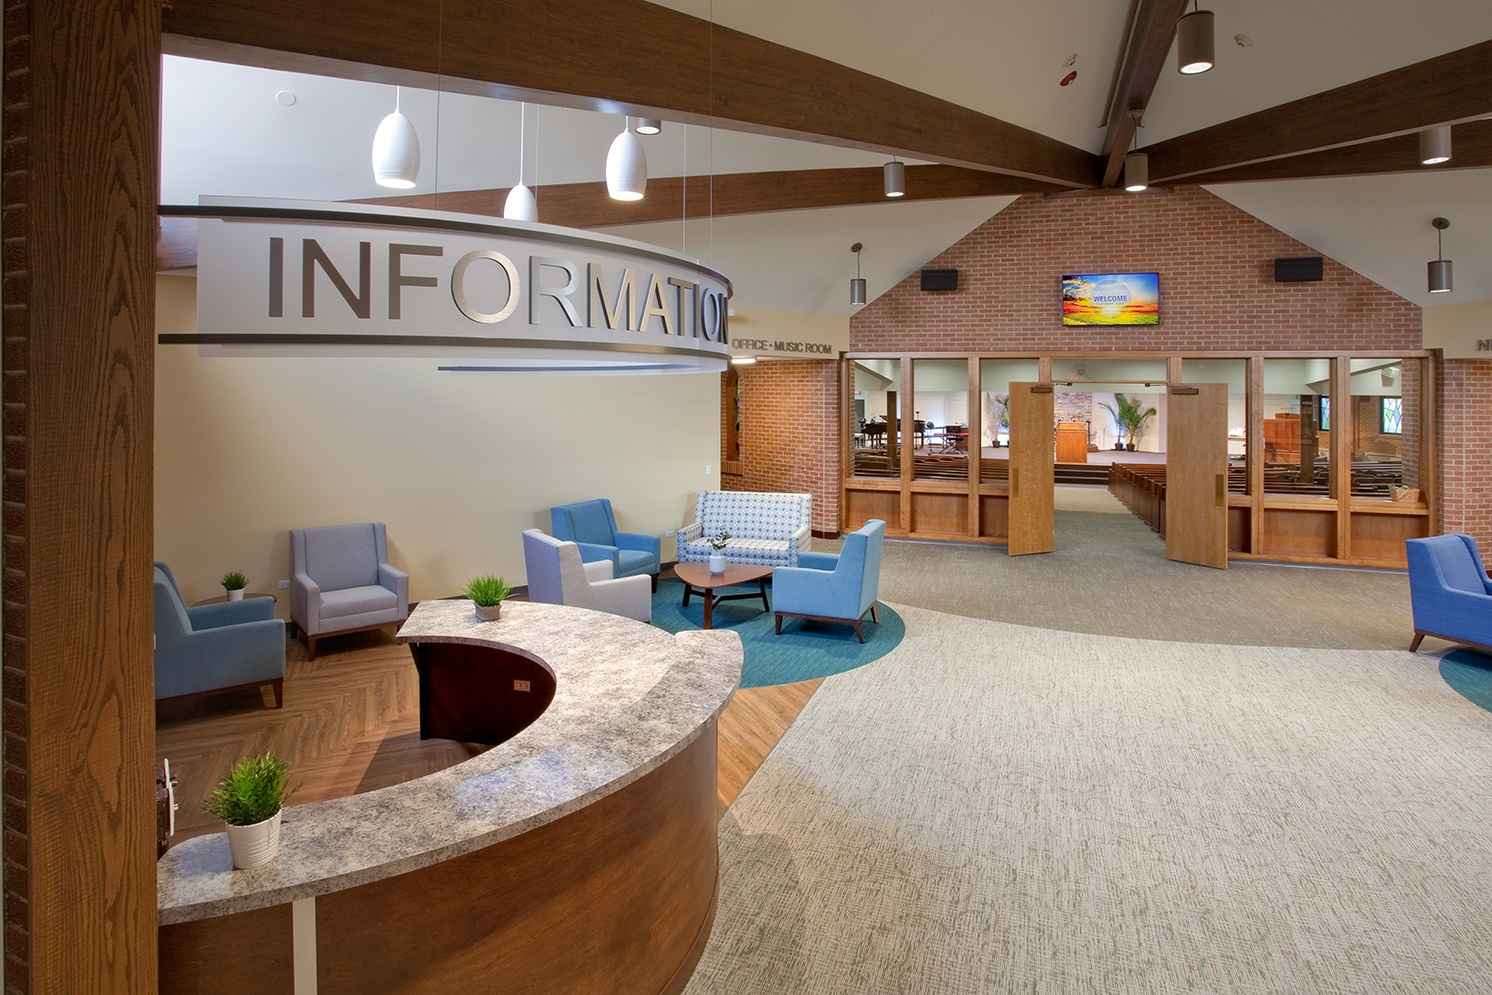 orland-park-lobby-information-web.jpg